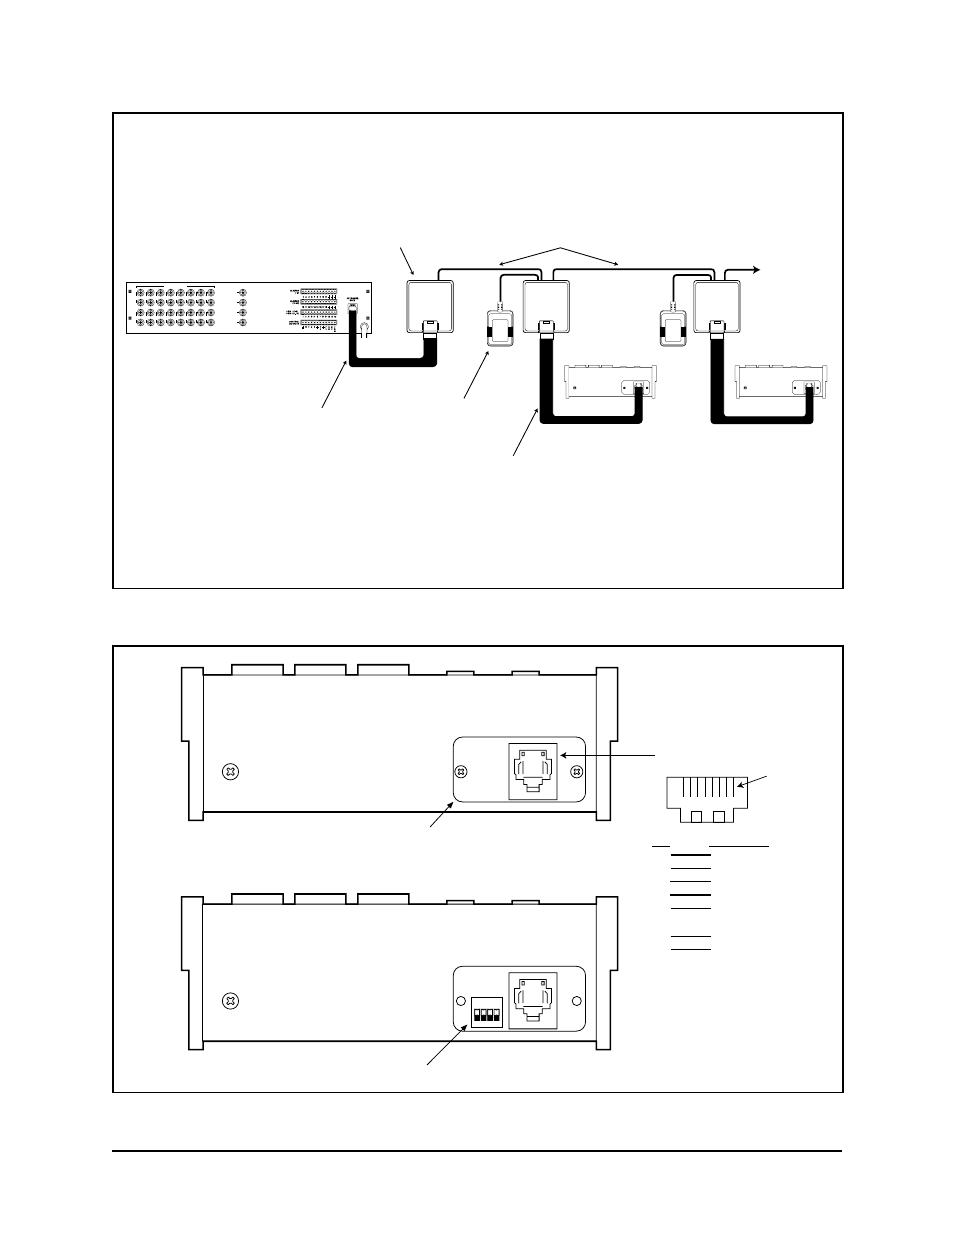 figure 3 keyboard cabling diagram  figure 4 keyboard rear panel  cm6700 scu pelco kbd300 Manuals in PDF Instruction Manual Book